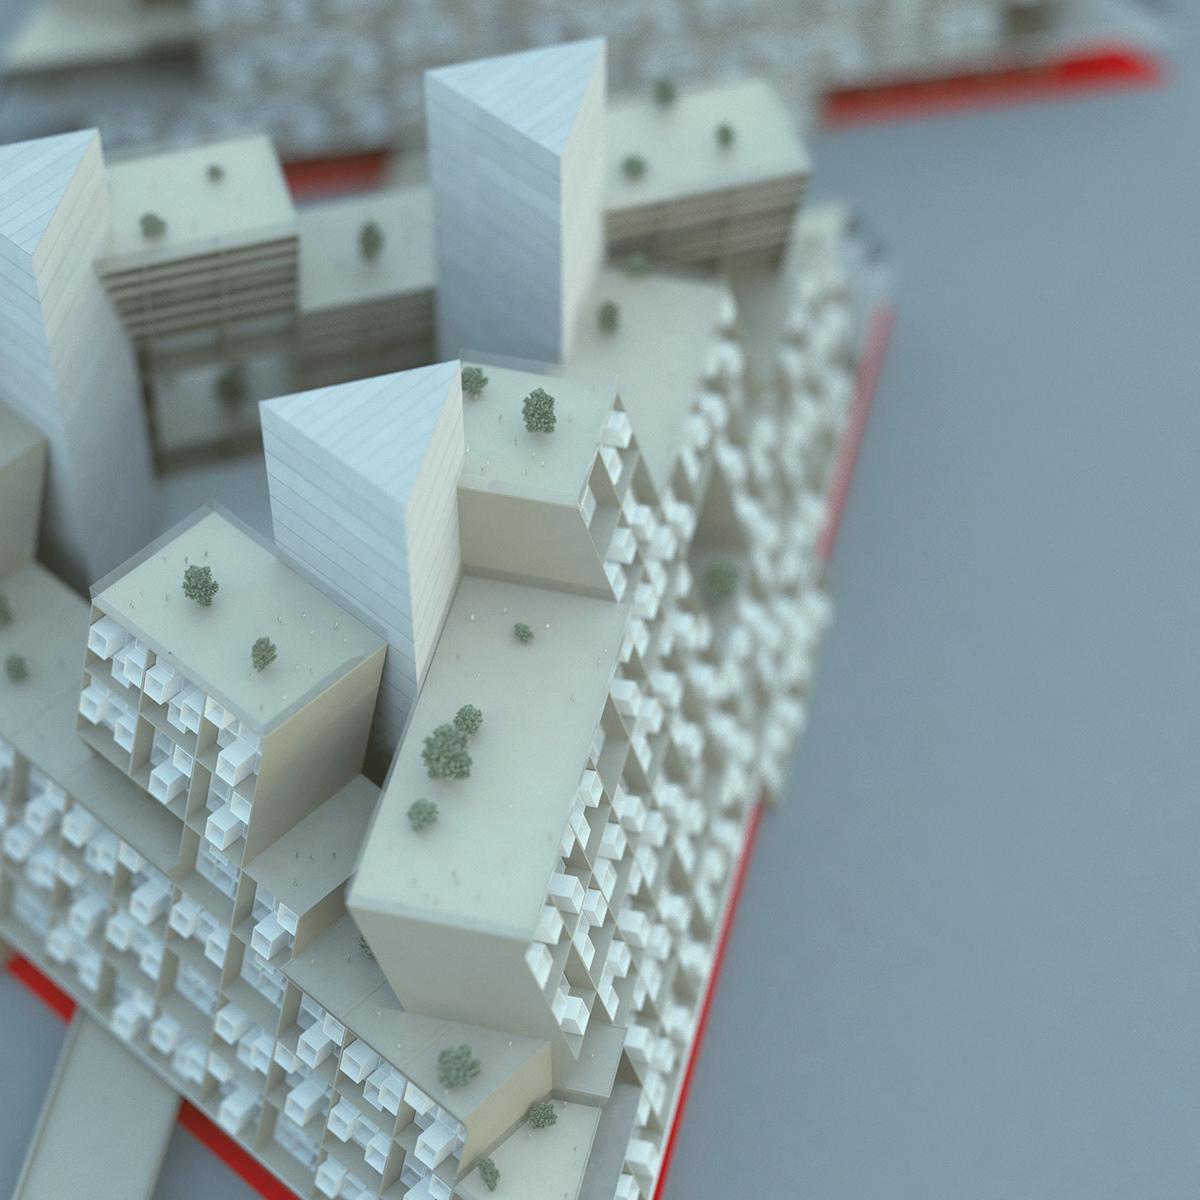 richard buckminster fuller 3D studio MAX CG artist digital jon stone jon stone Triton city sea utopia Utopian Optimism